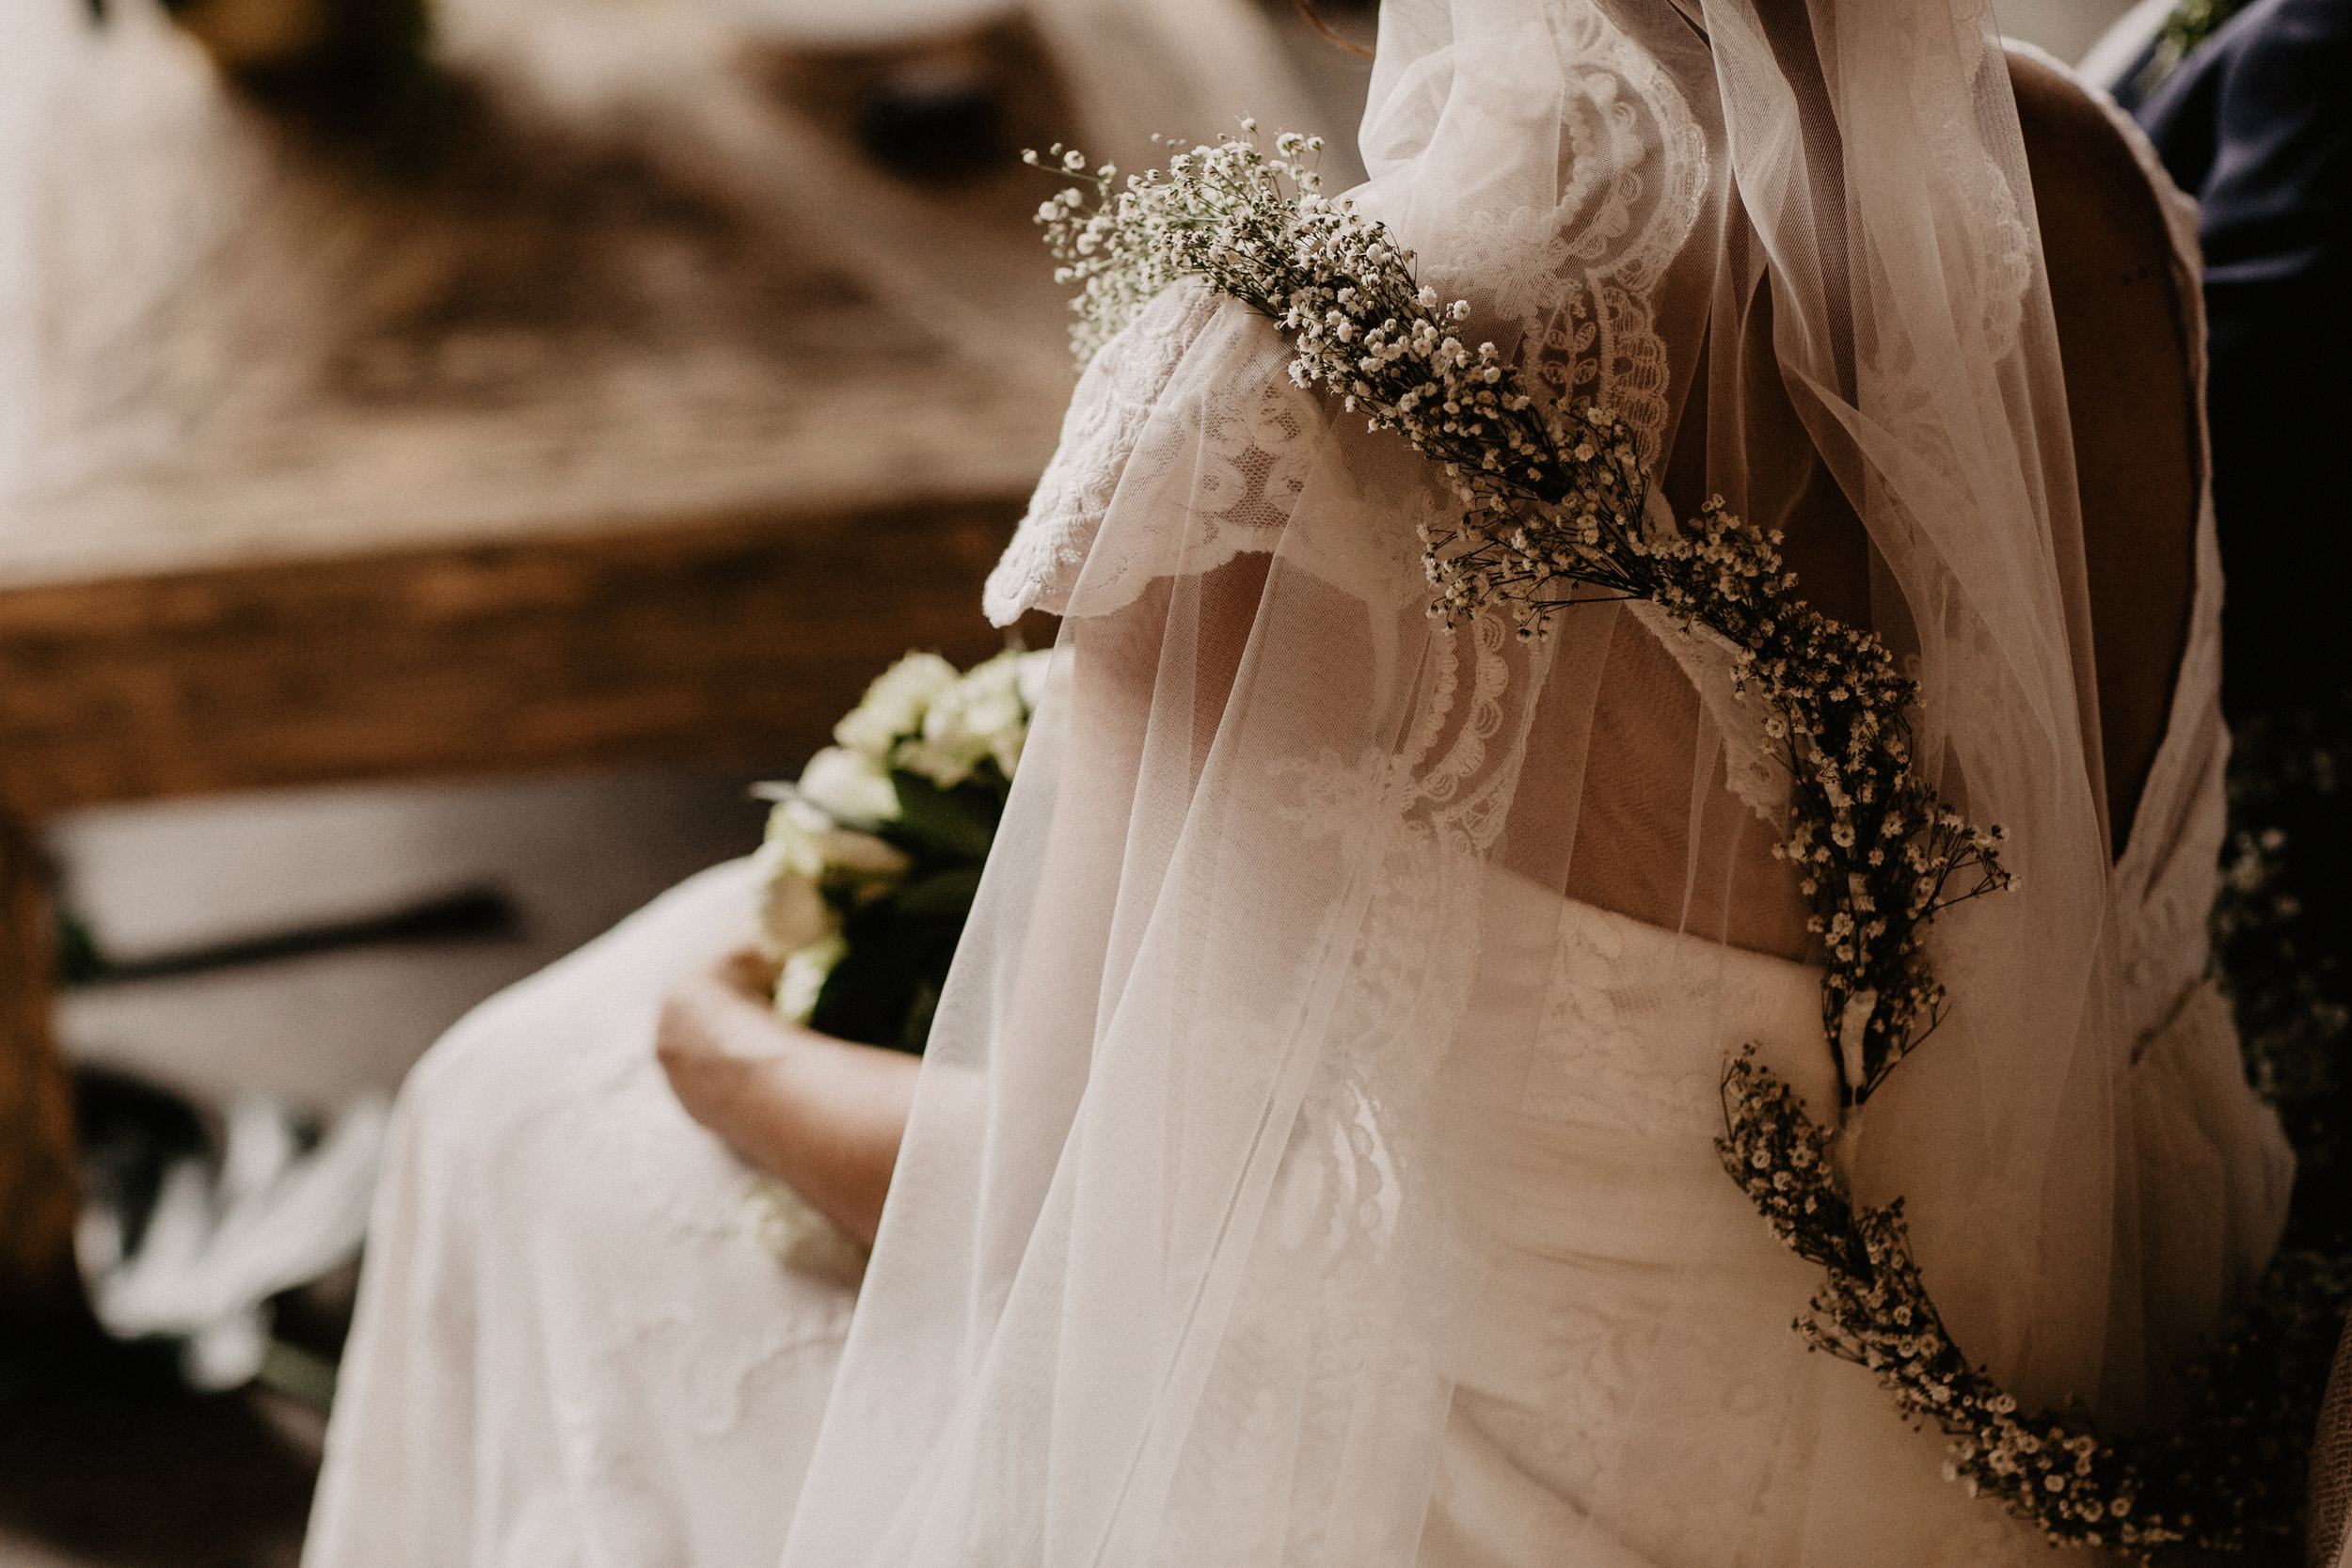 alfonso_flores_destination_wedding_photographer_pau_alonso_508.JPG